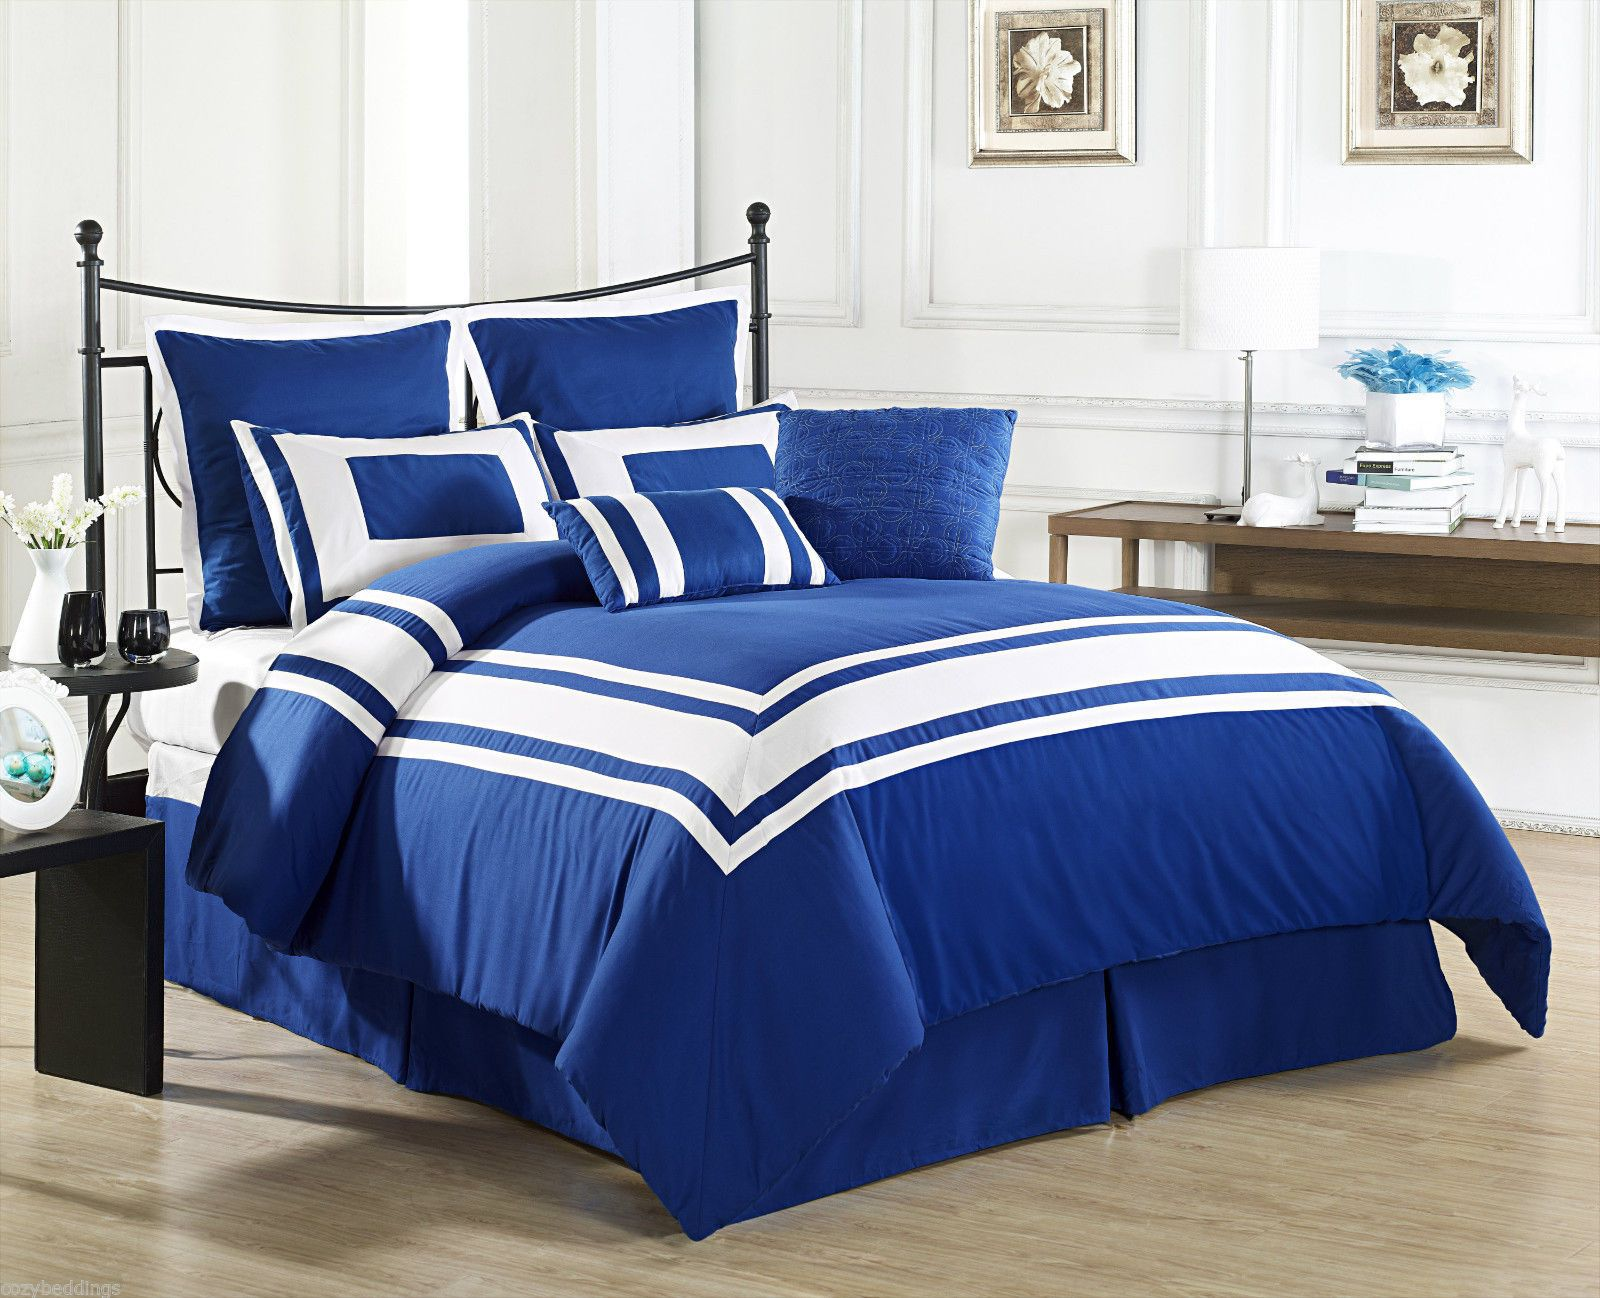 Lux Decor Royal Blue Queen Size Bed 8 Piece Comforter Set White